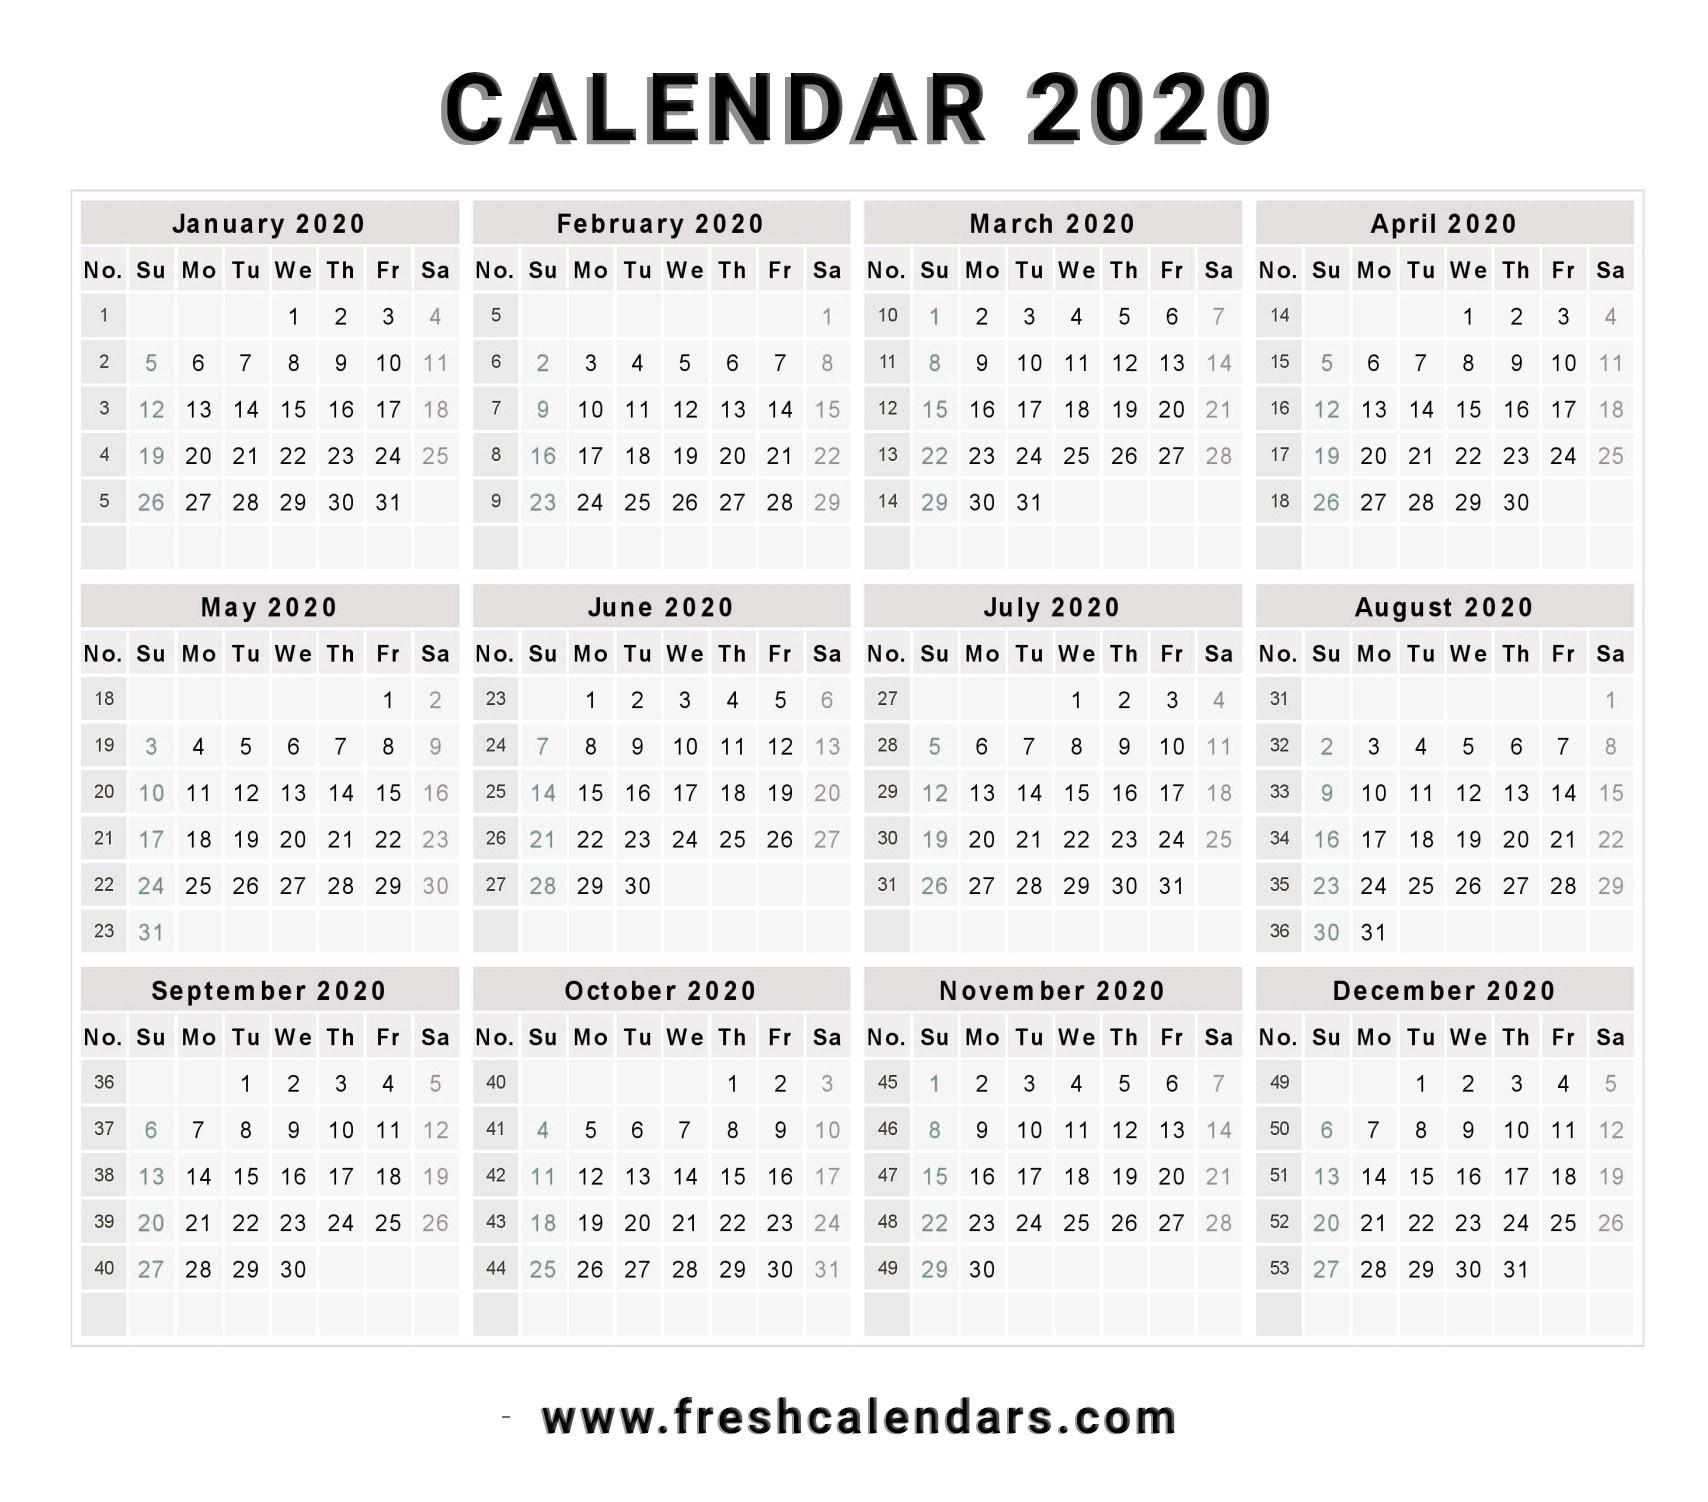 Calendar 2020 Printable 2020 Calendar